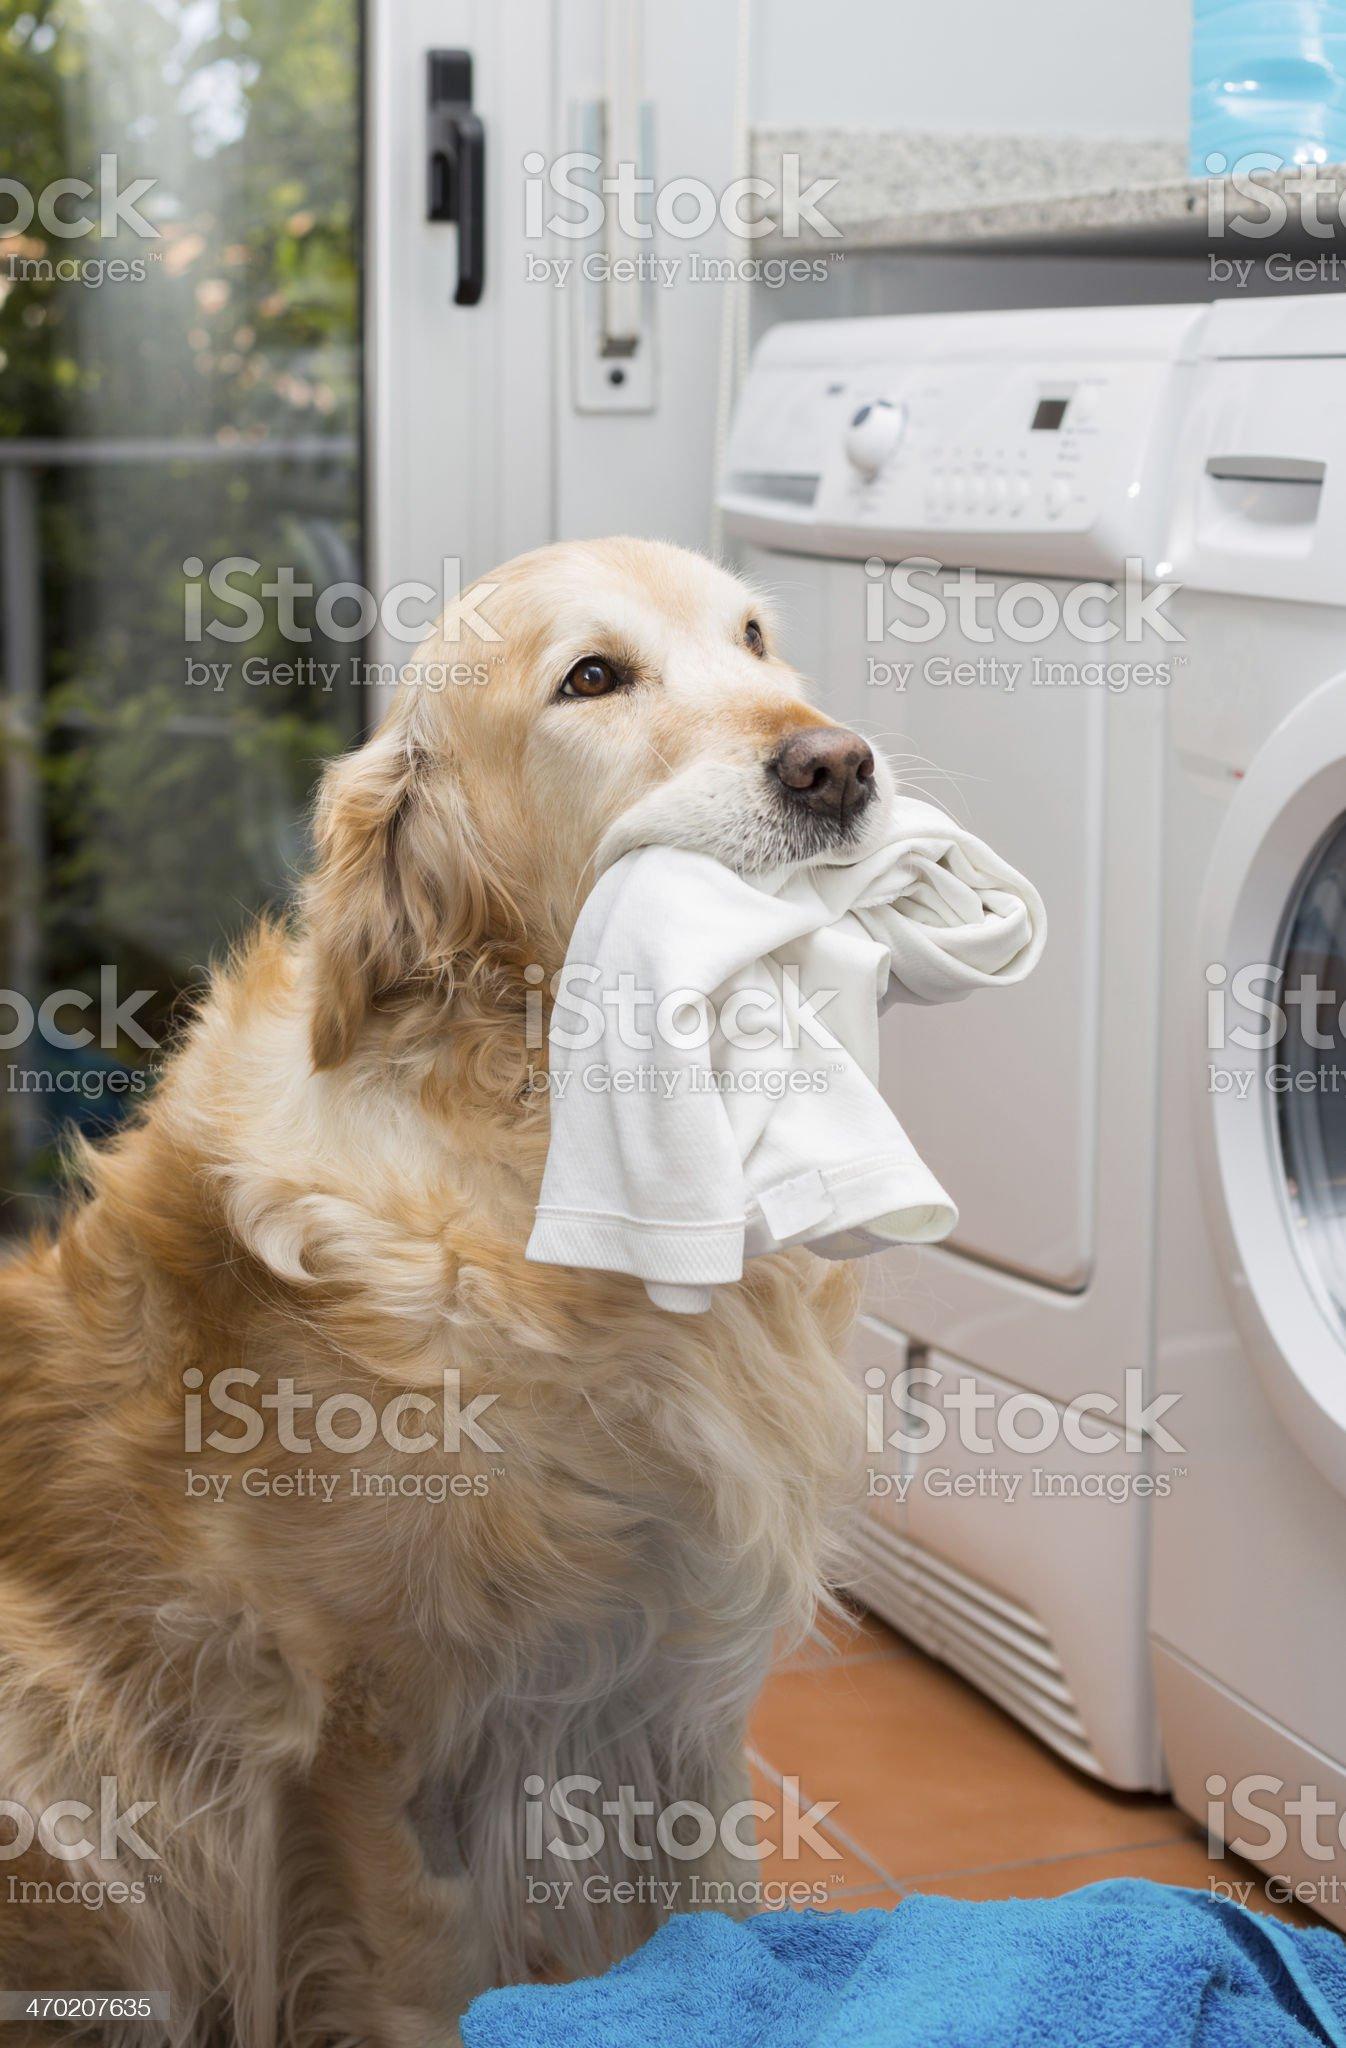 Golden Retriever doing laundry royalty-free stock photo